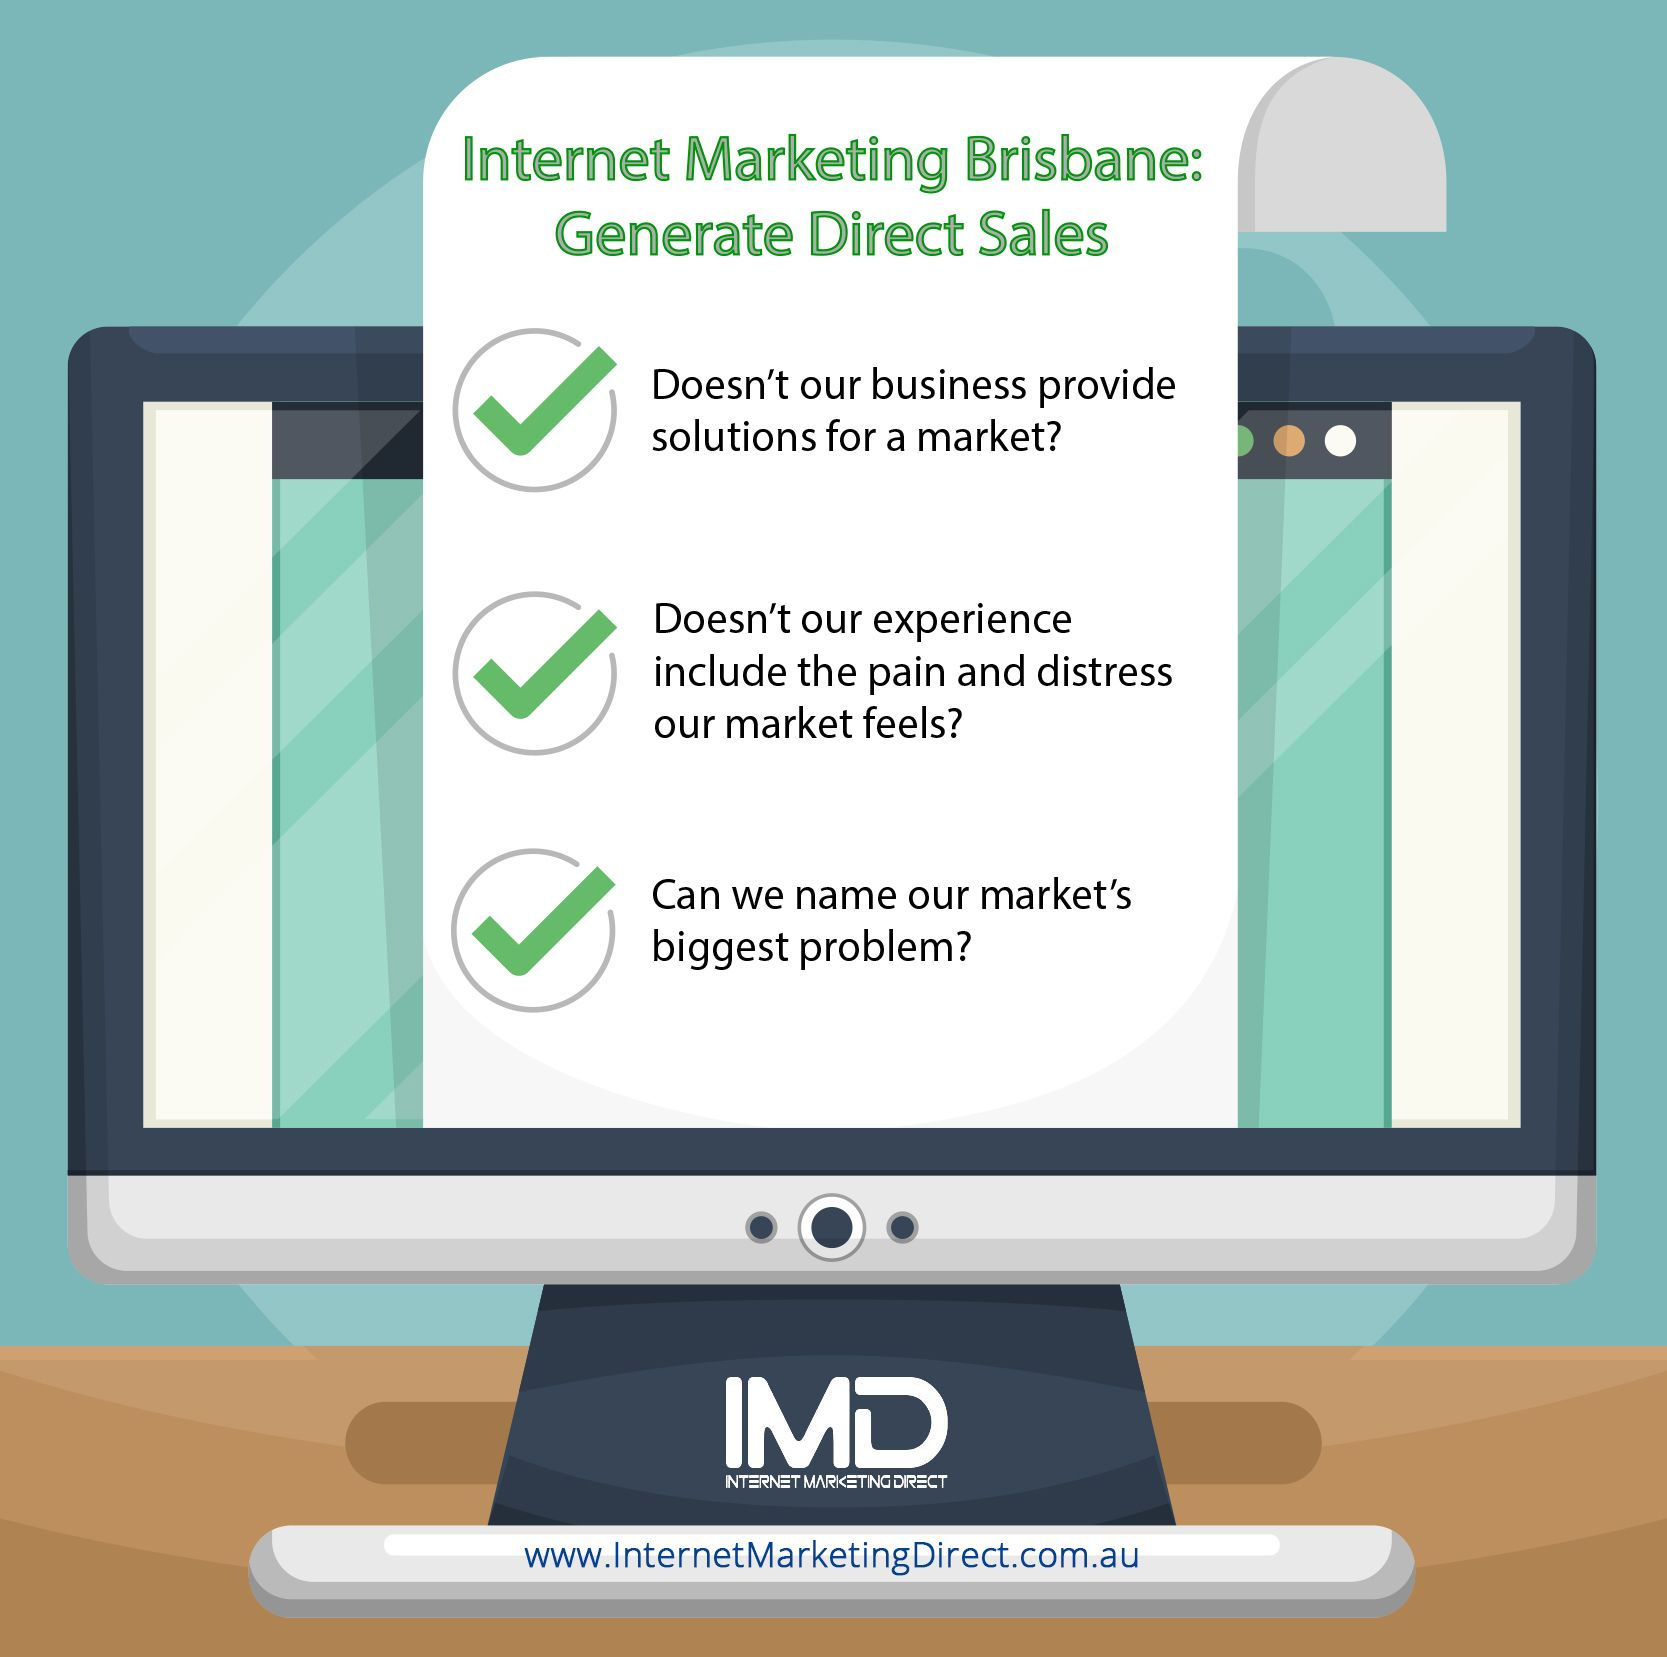 May 2017 Internet Marketing Direct Internet Marketing Brisbane